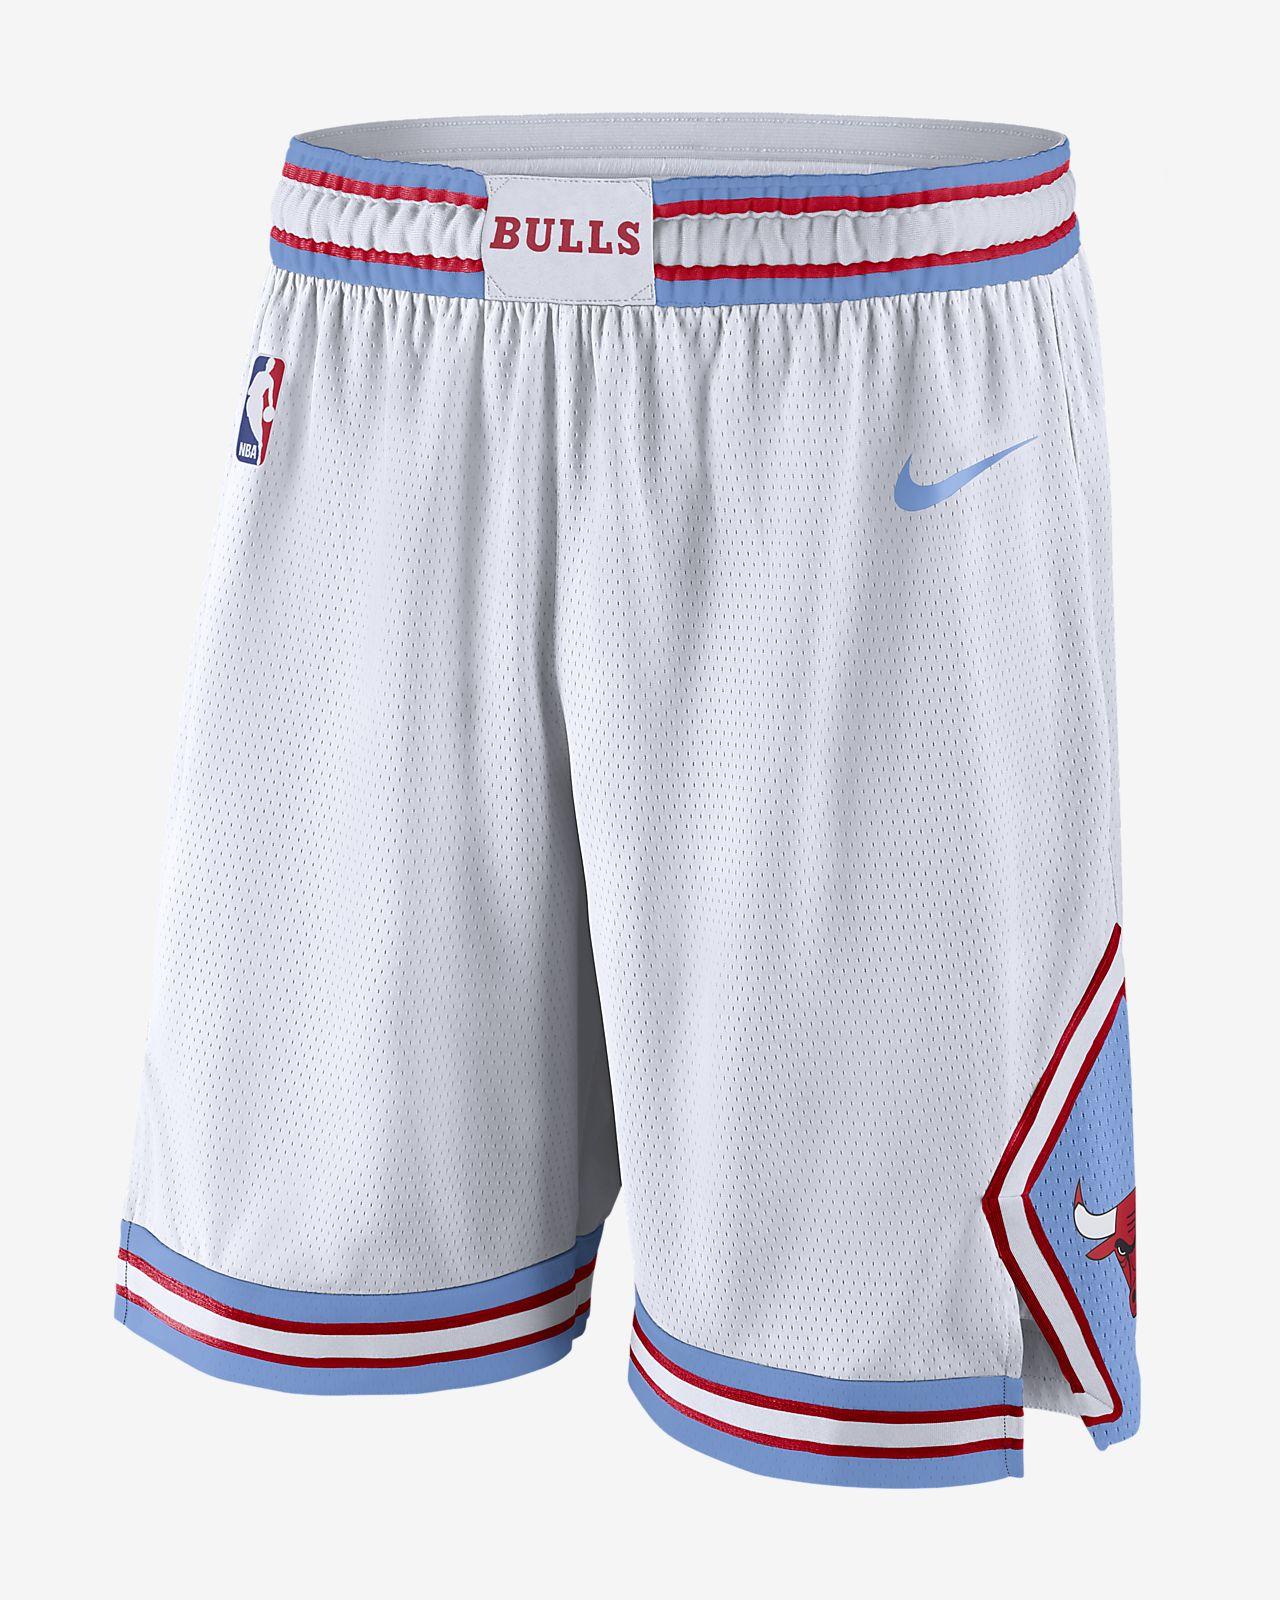 ... Chicago Bulls Nike City Edition Swingman Men's NBA Shorts